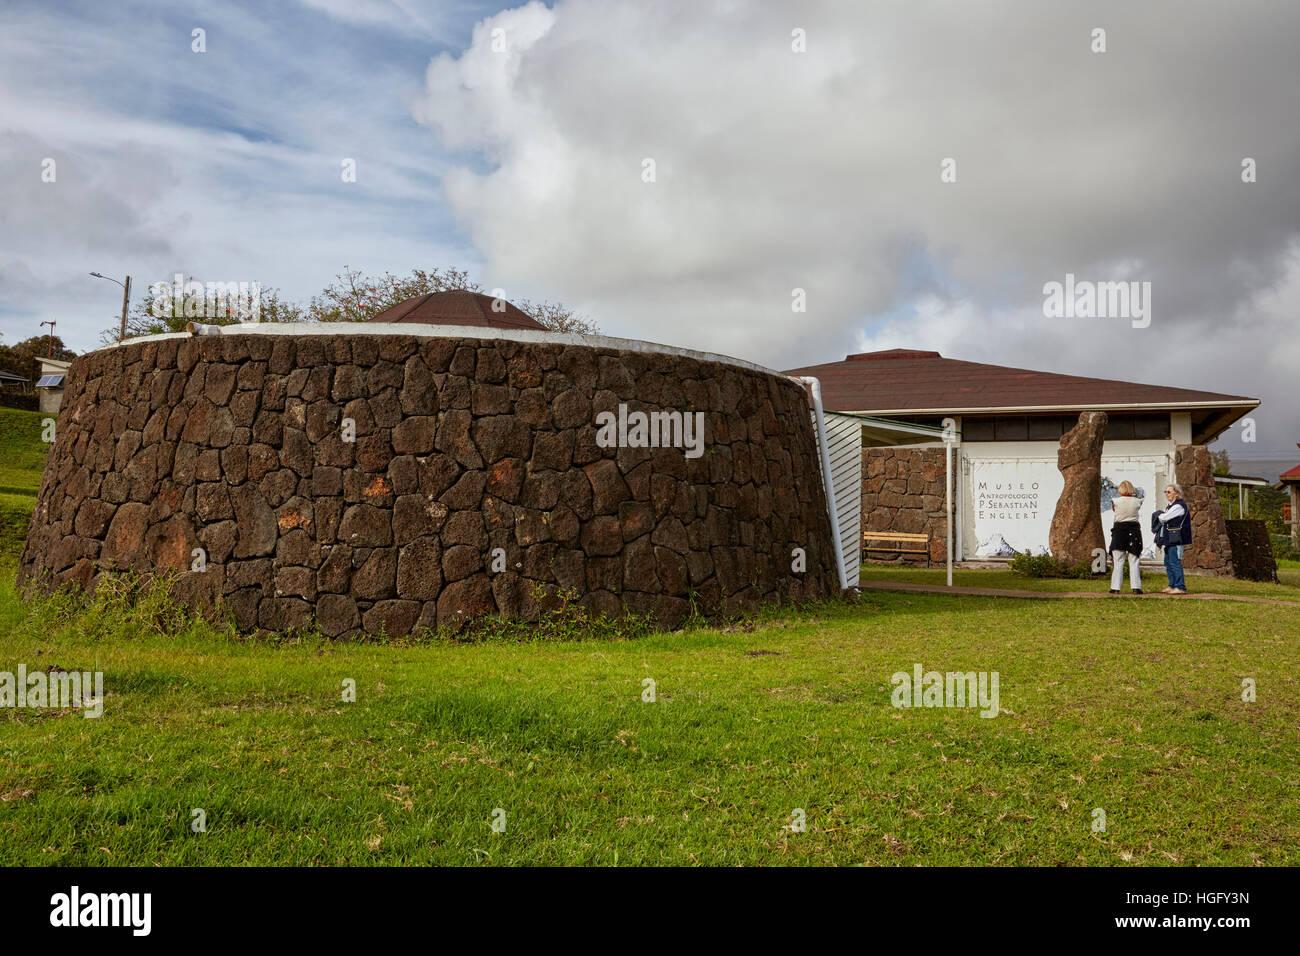 Anthropological museum, Museo Antropologico Padre Sebastian Englert, Easter Island - Stock Image